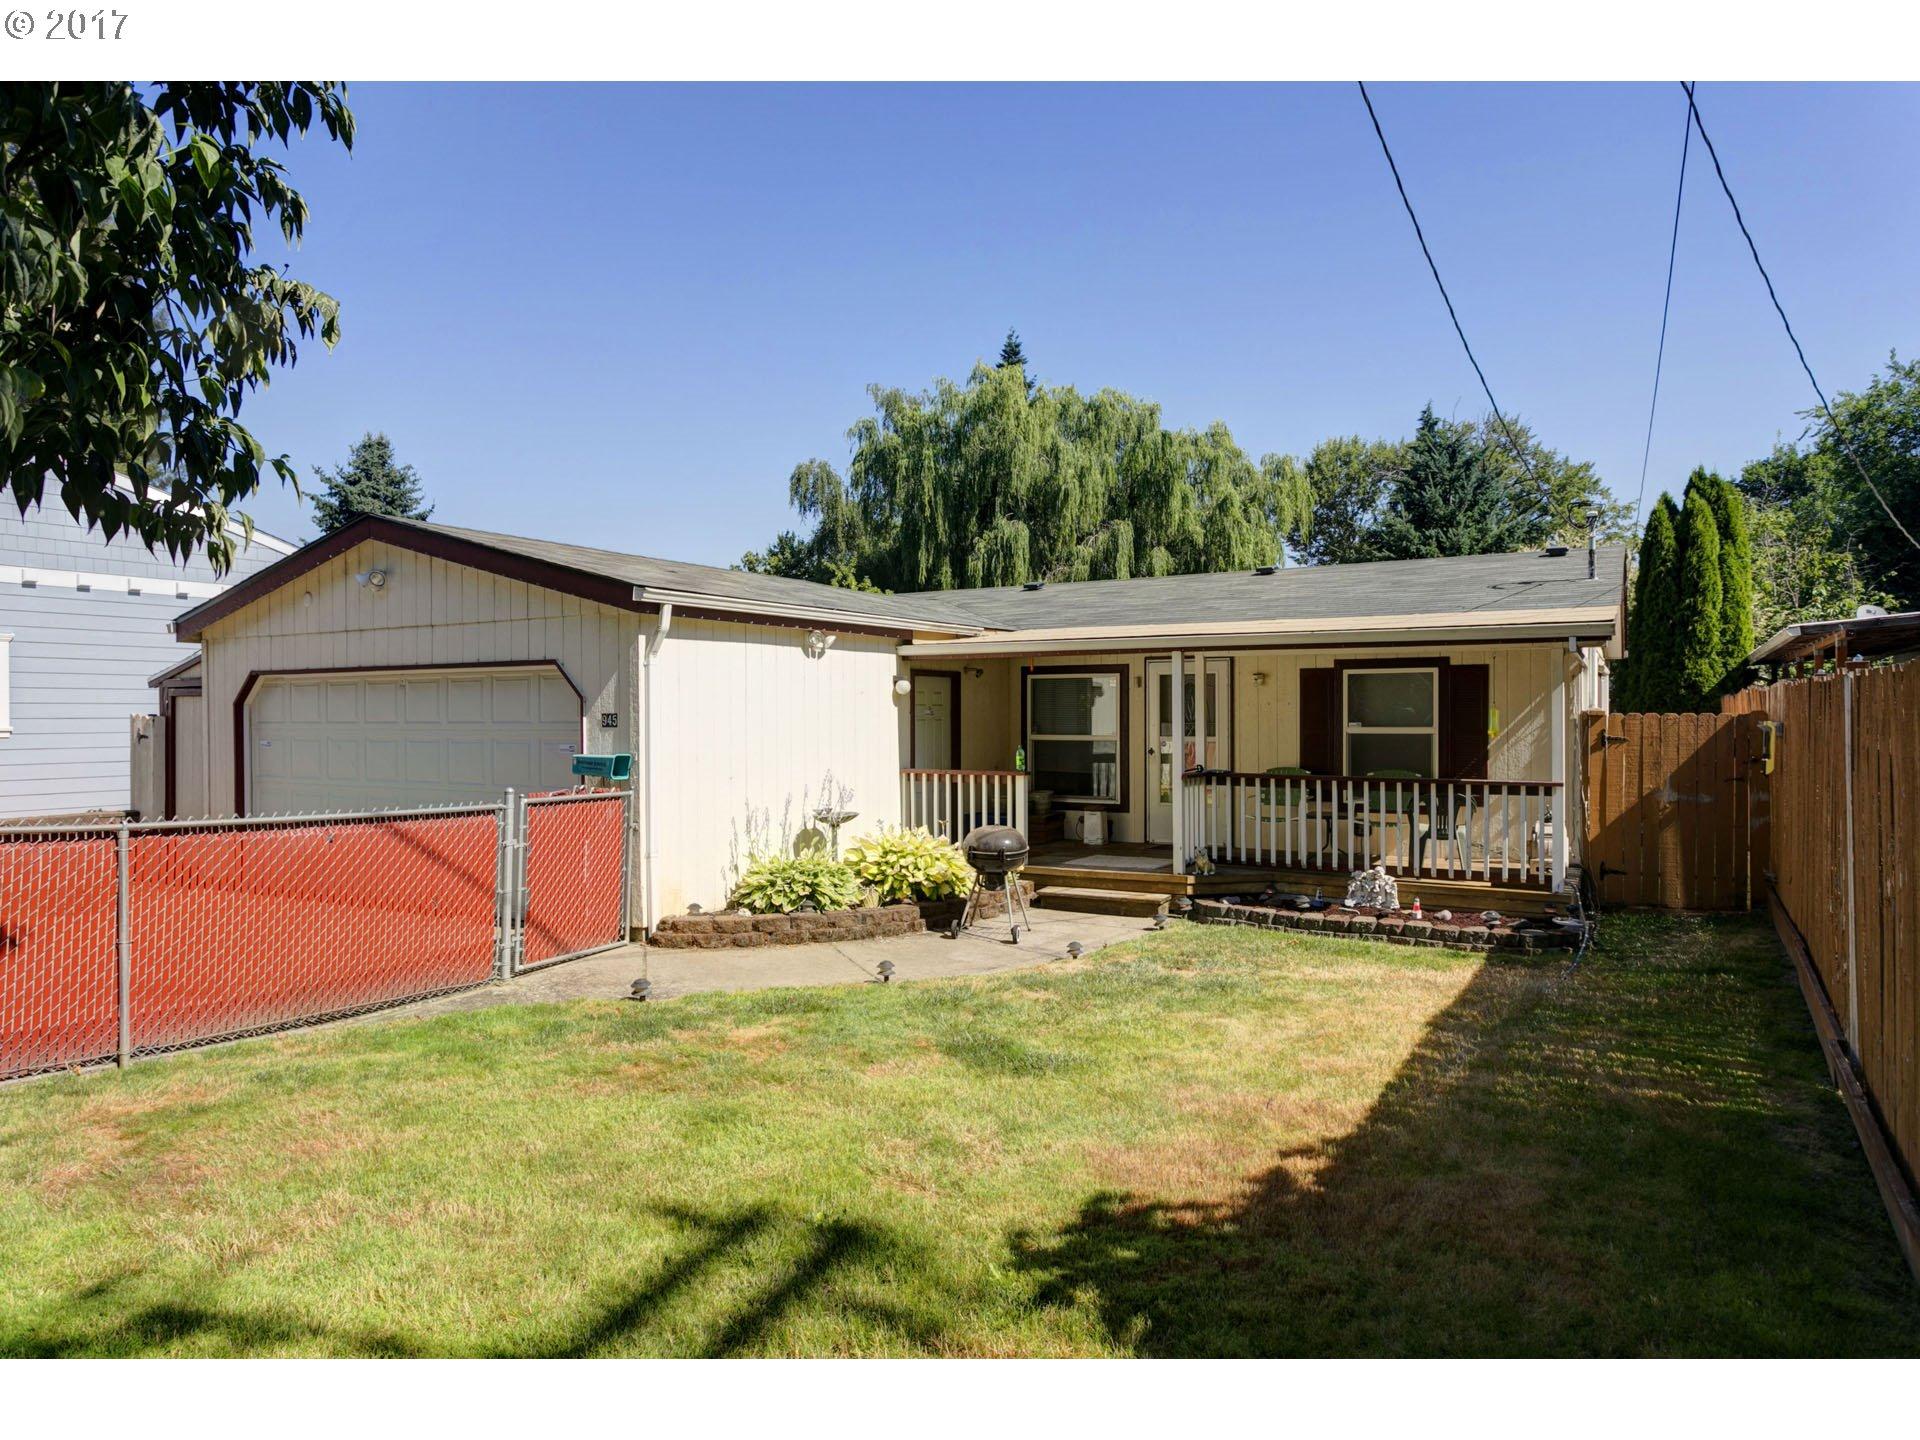 945 W HAYES ST, Woodburn, OR 97071